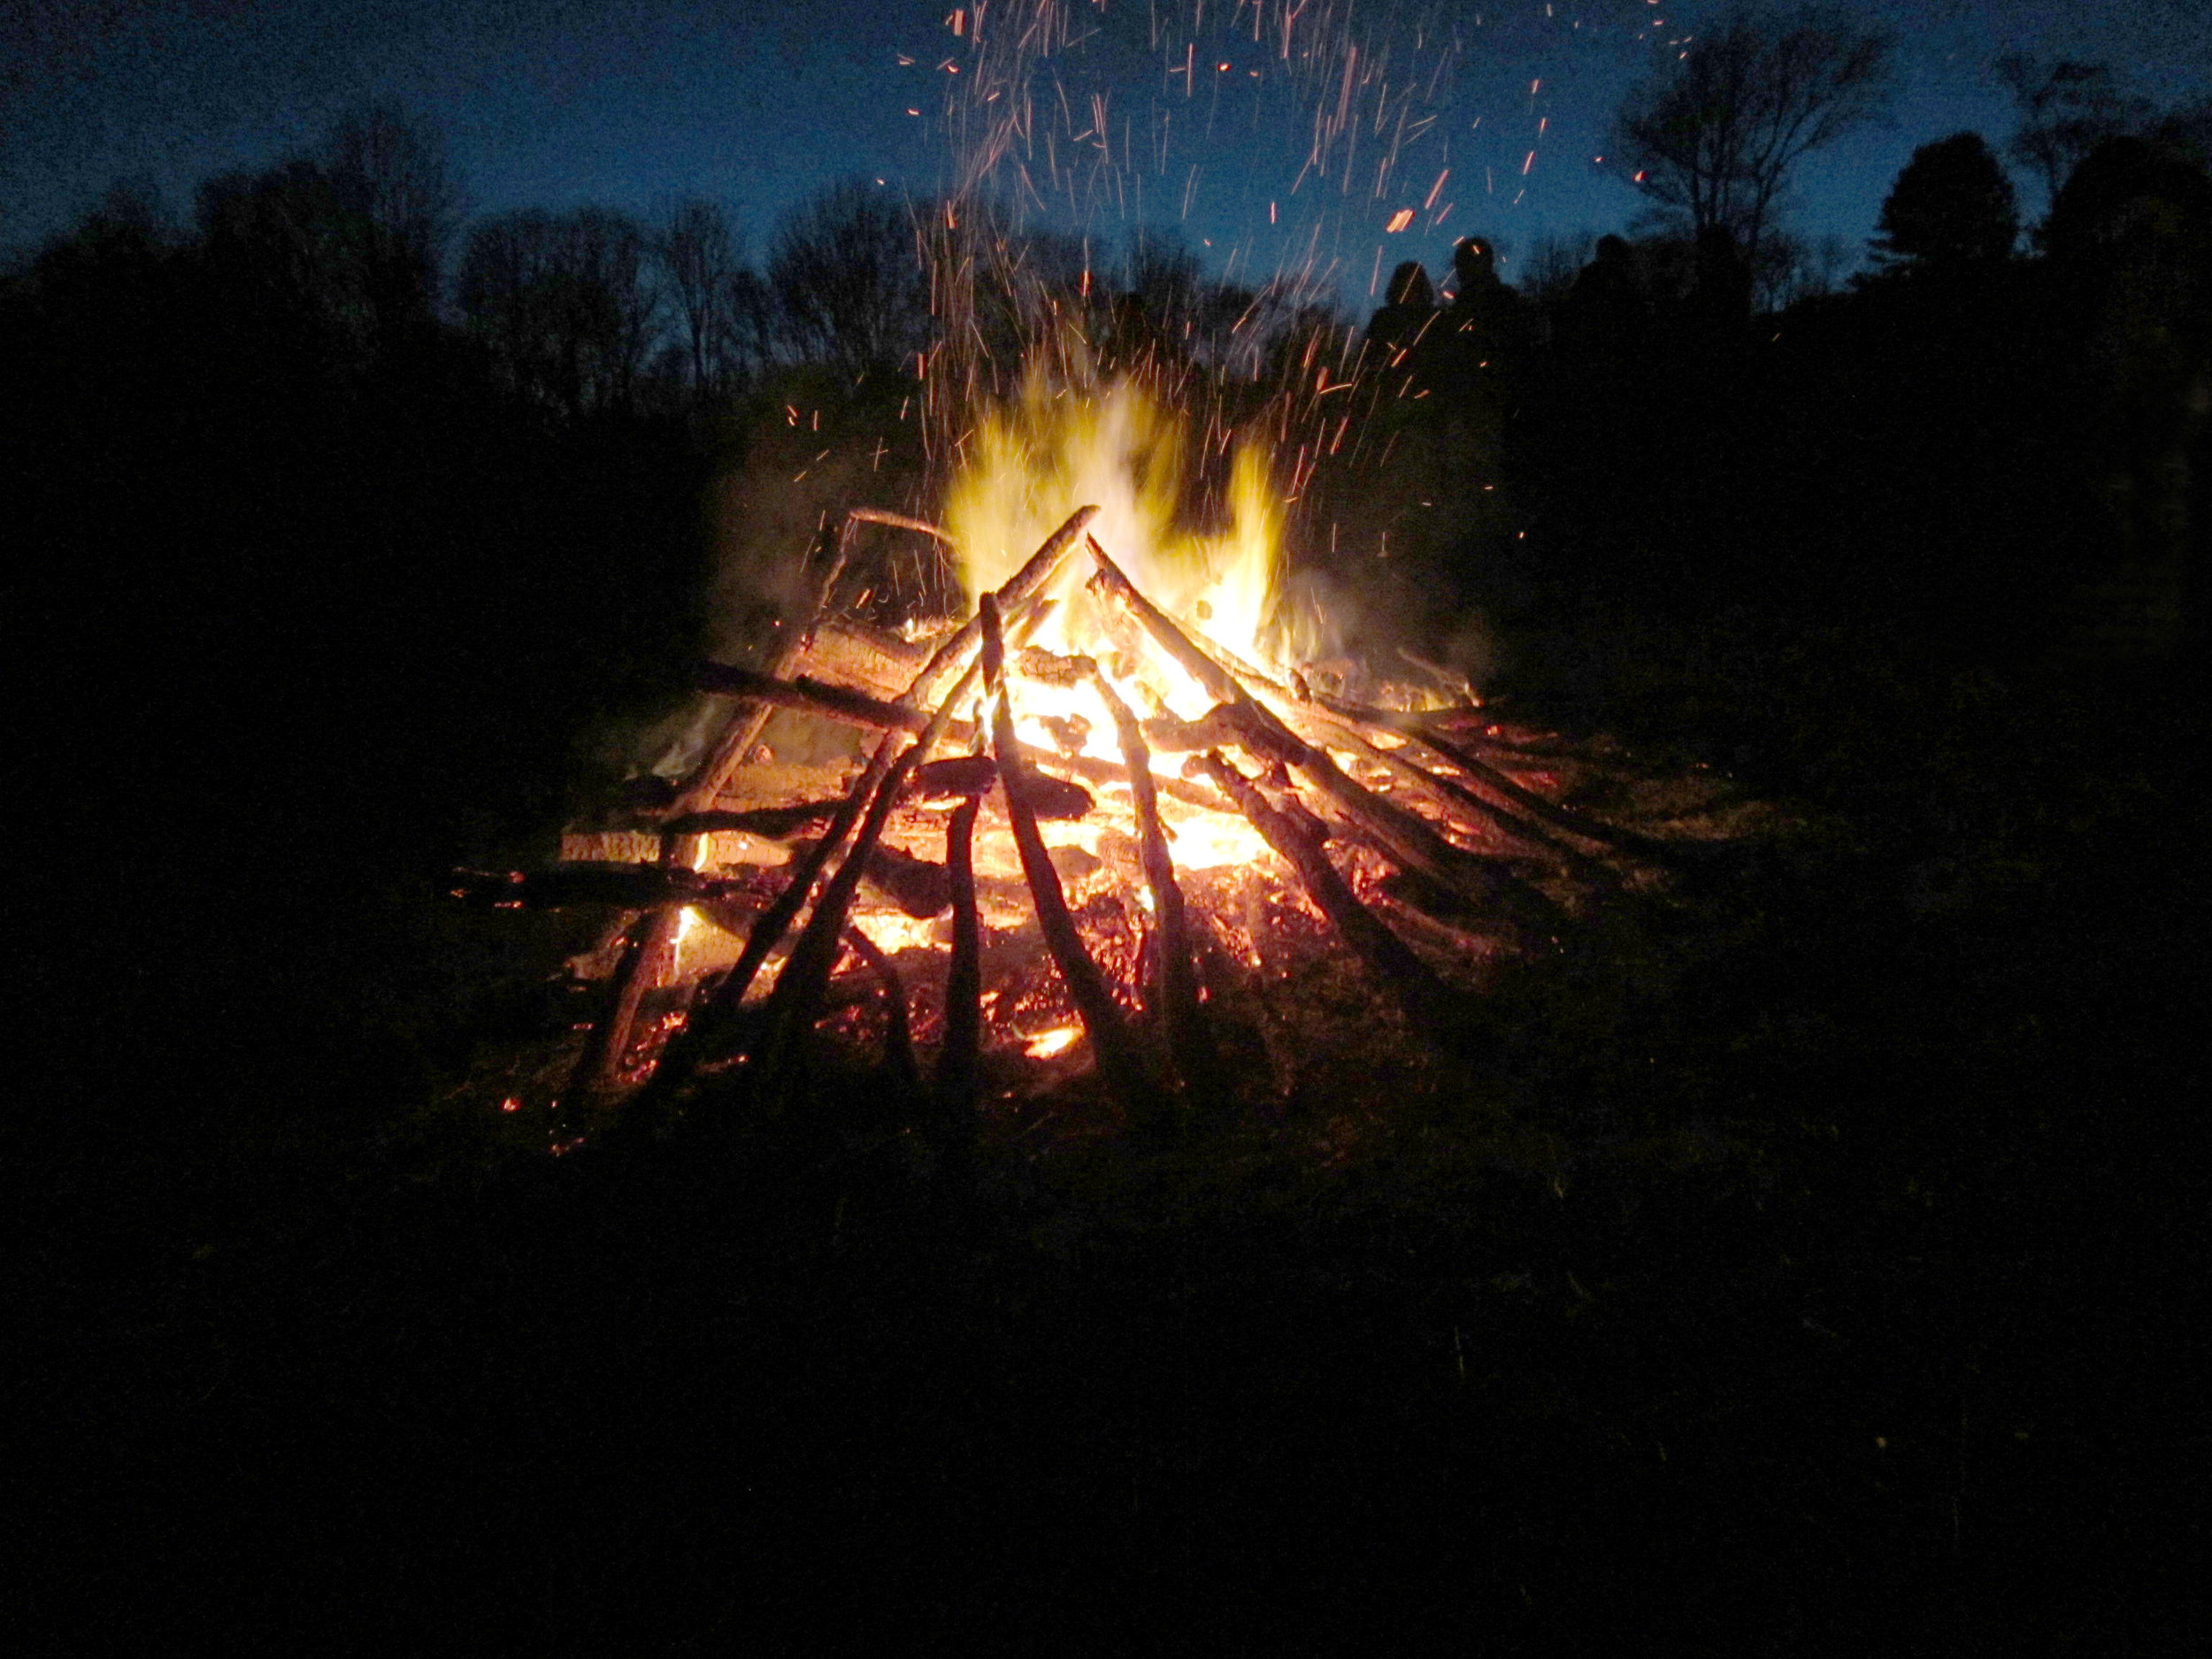 slt fusina new site moonlight stroll fire.jpg